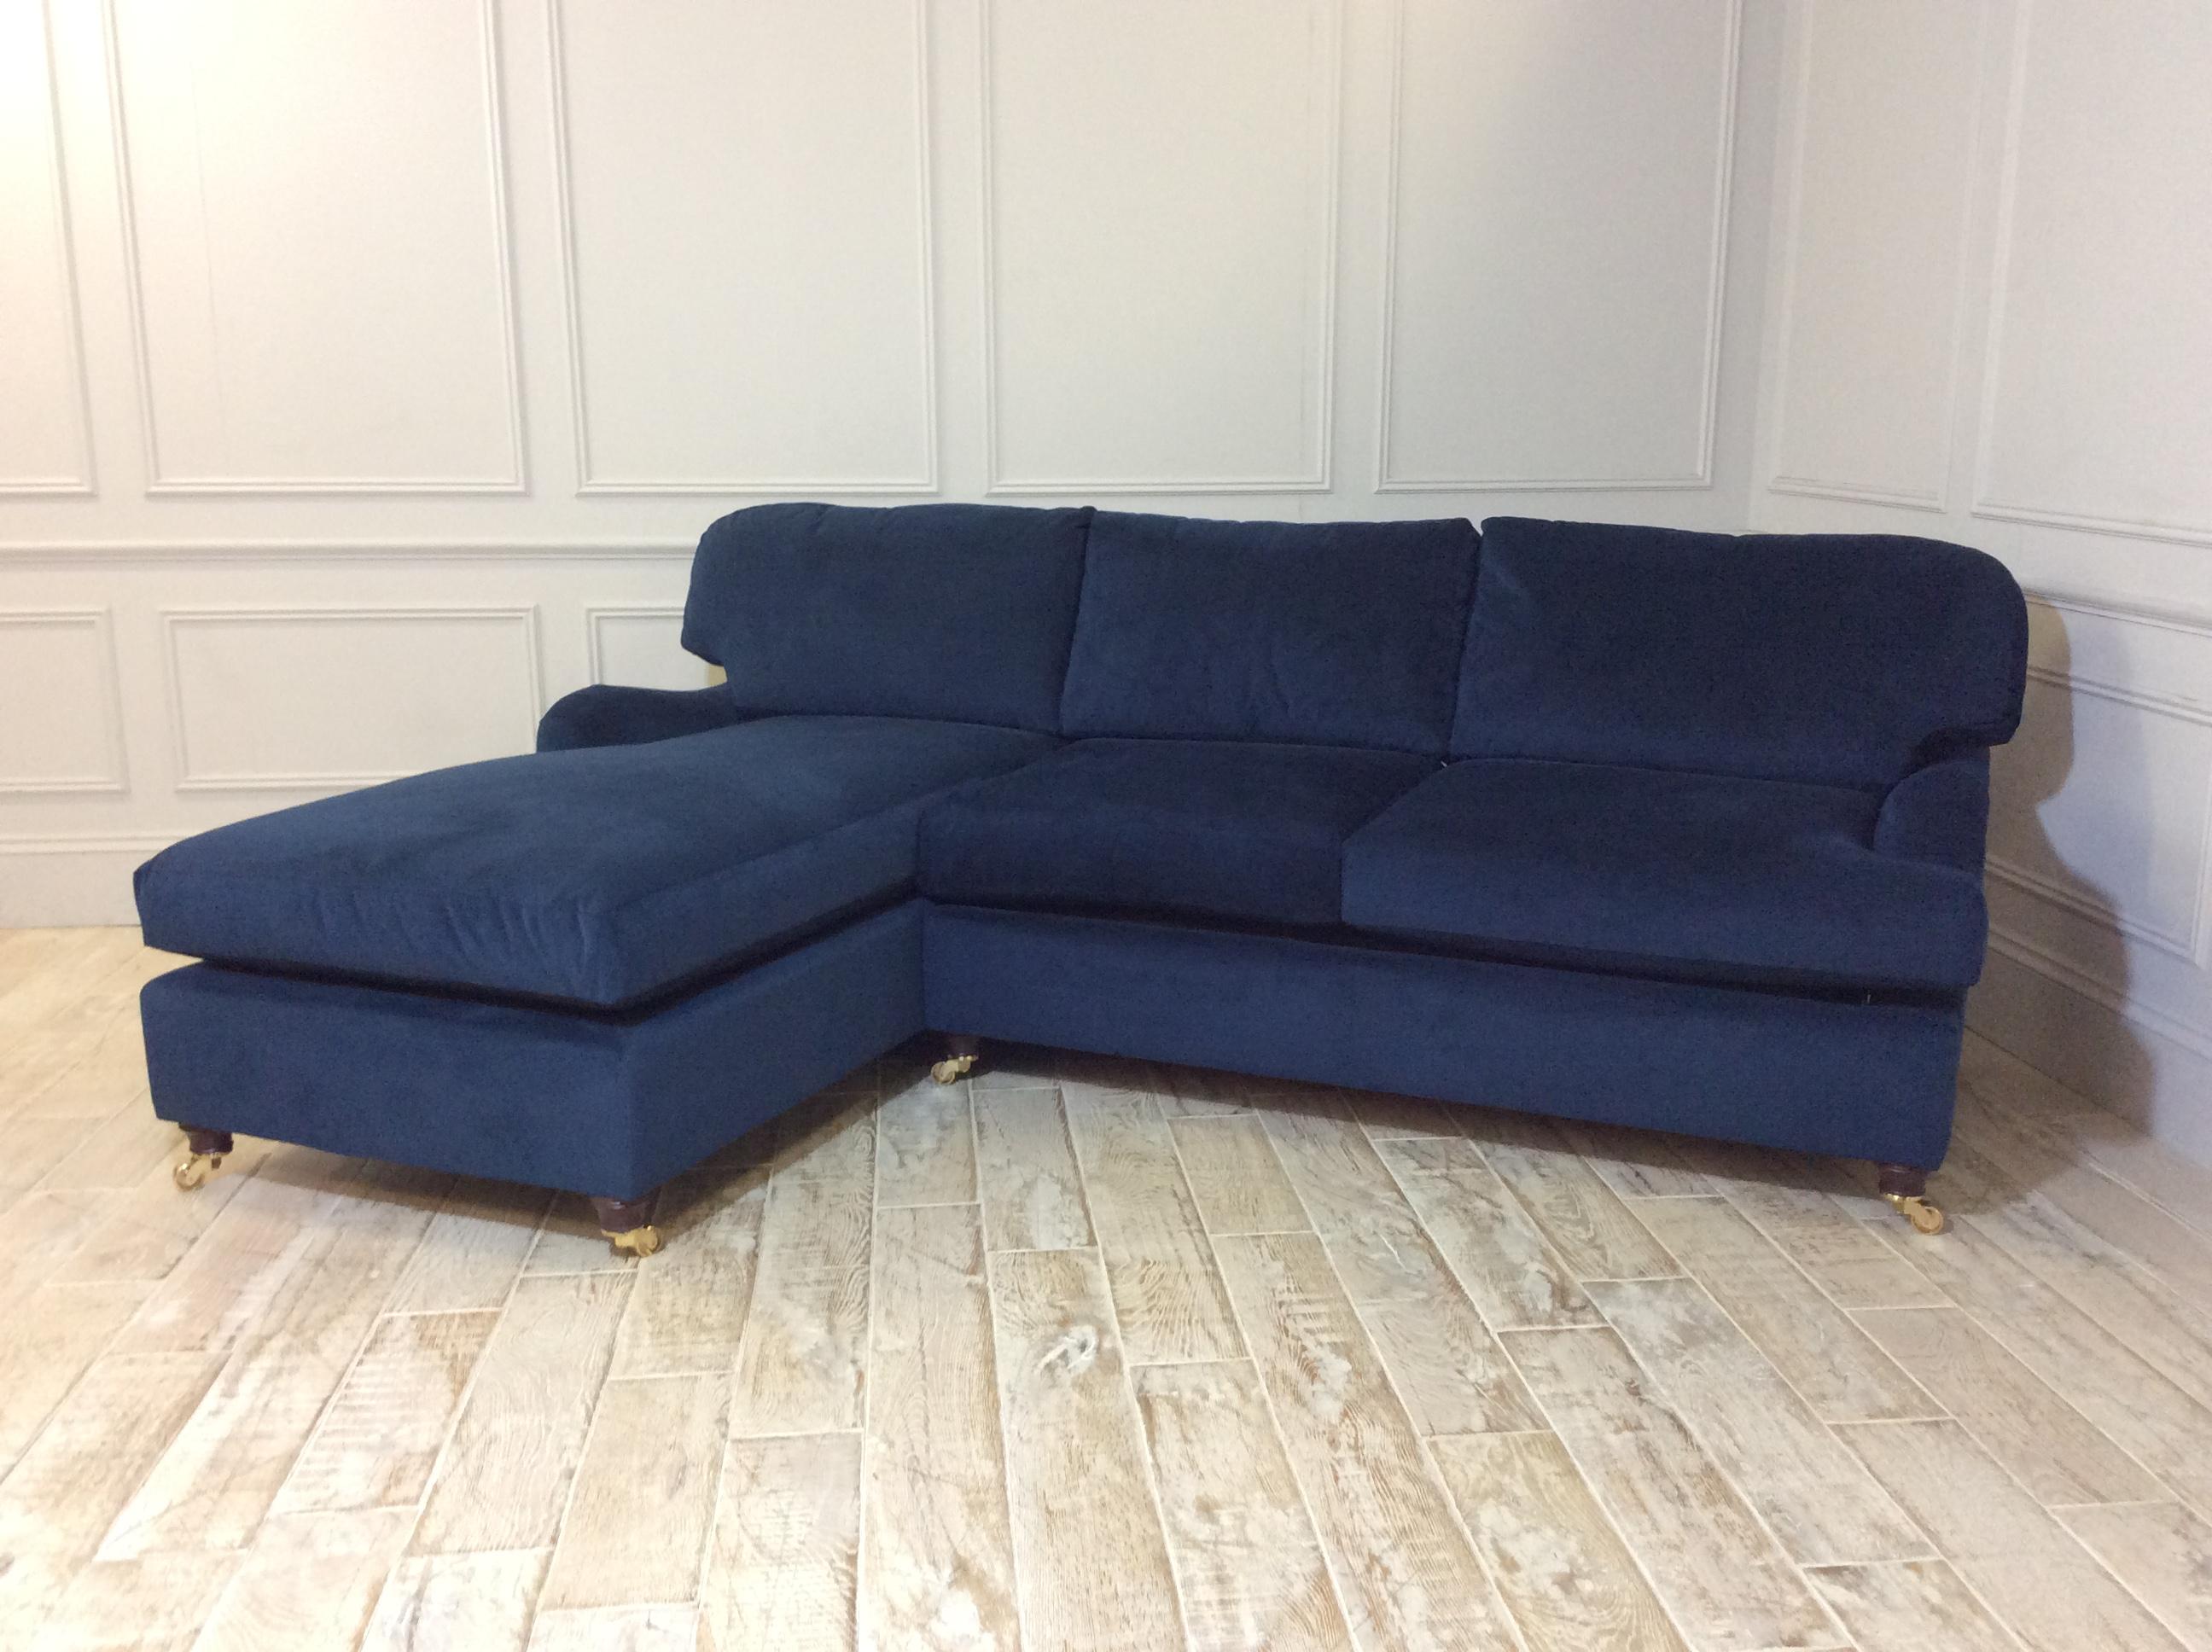 Helston 3 Seater Chaise Sofa Bed in Easy Clean Plush Velvet Royal Blue